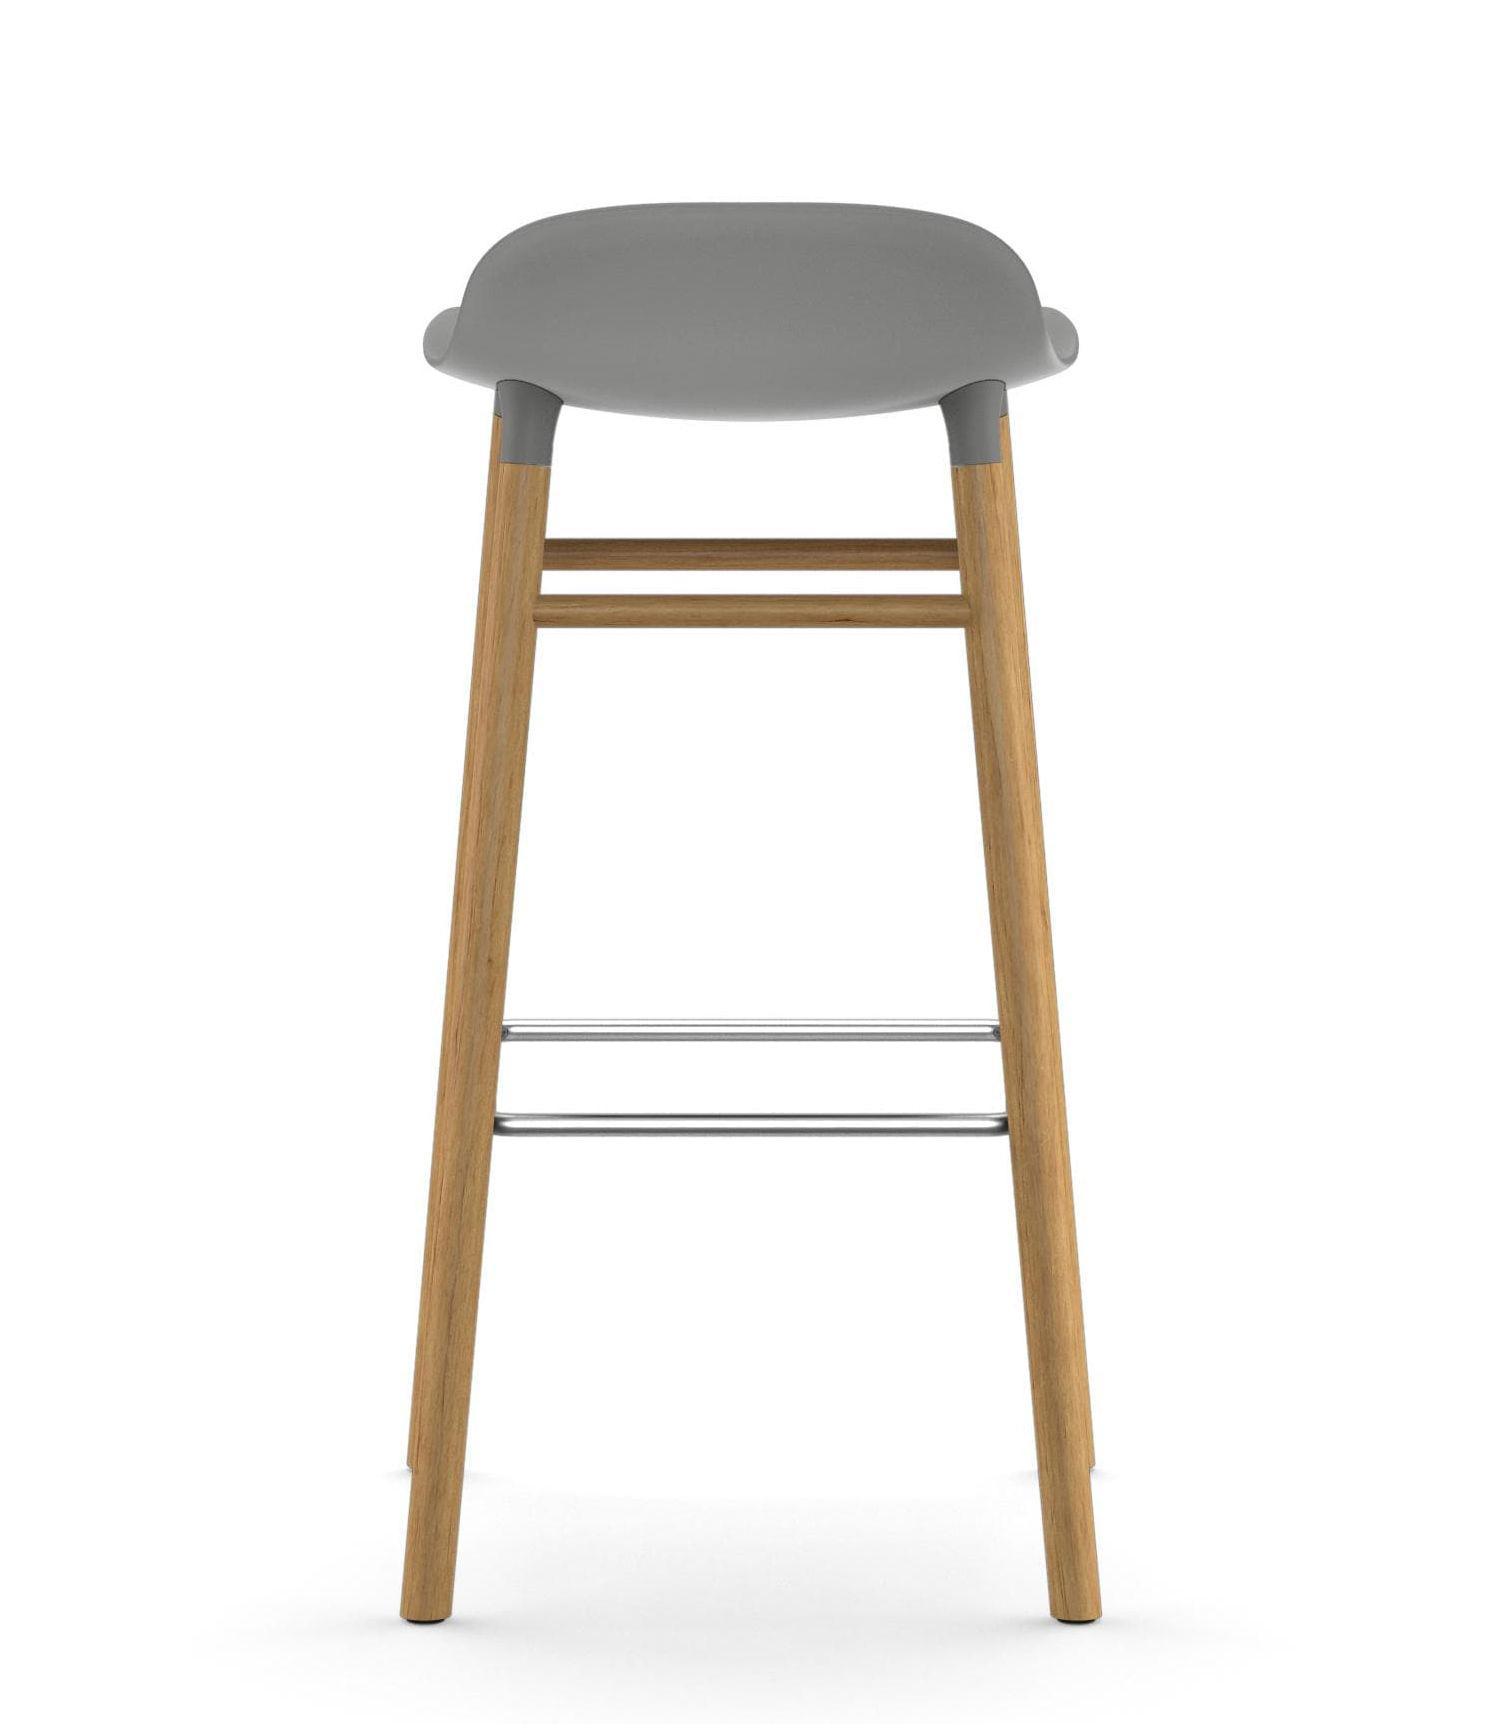 tabouret de bar form h 75 cm pied ch ne gris ch ne normann copenhagen made in design. Black Bedroom Furniture Sets. Home Design Ideas